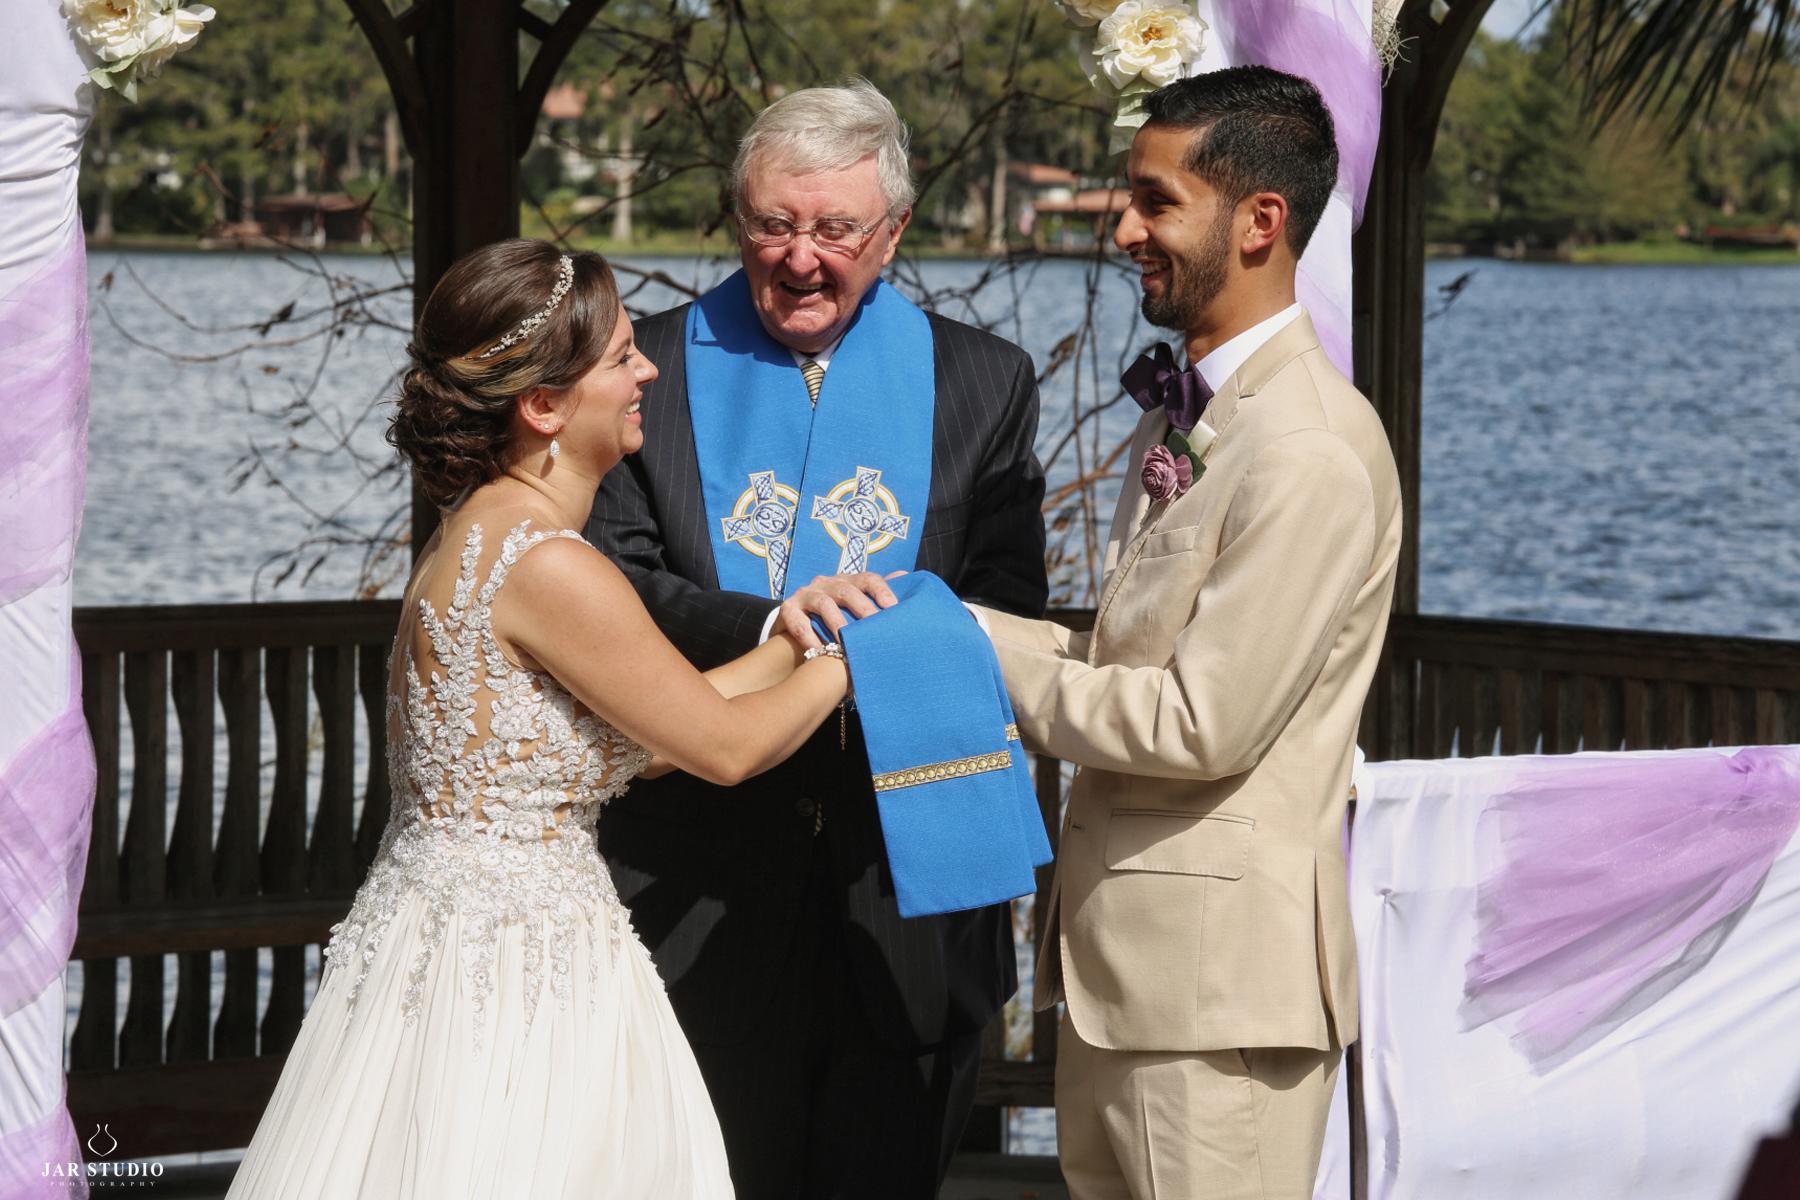 jarstudio-rollins-wedding-photographer-173.JPG